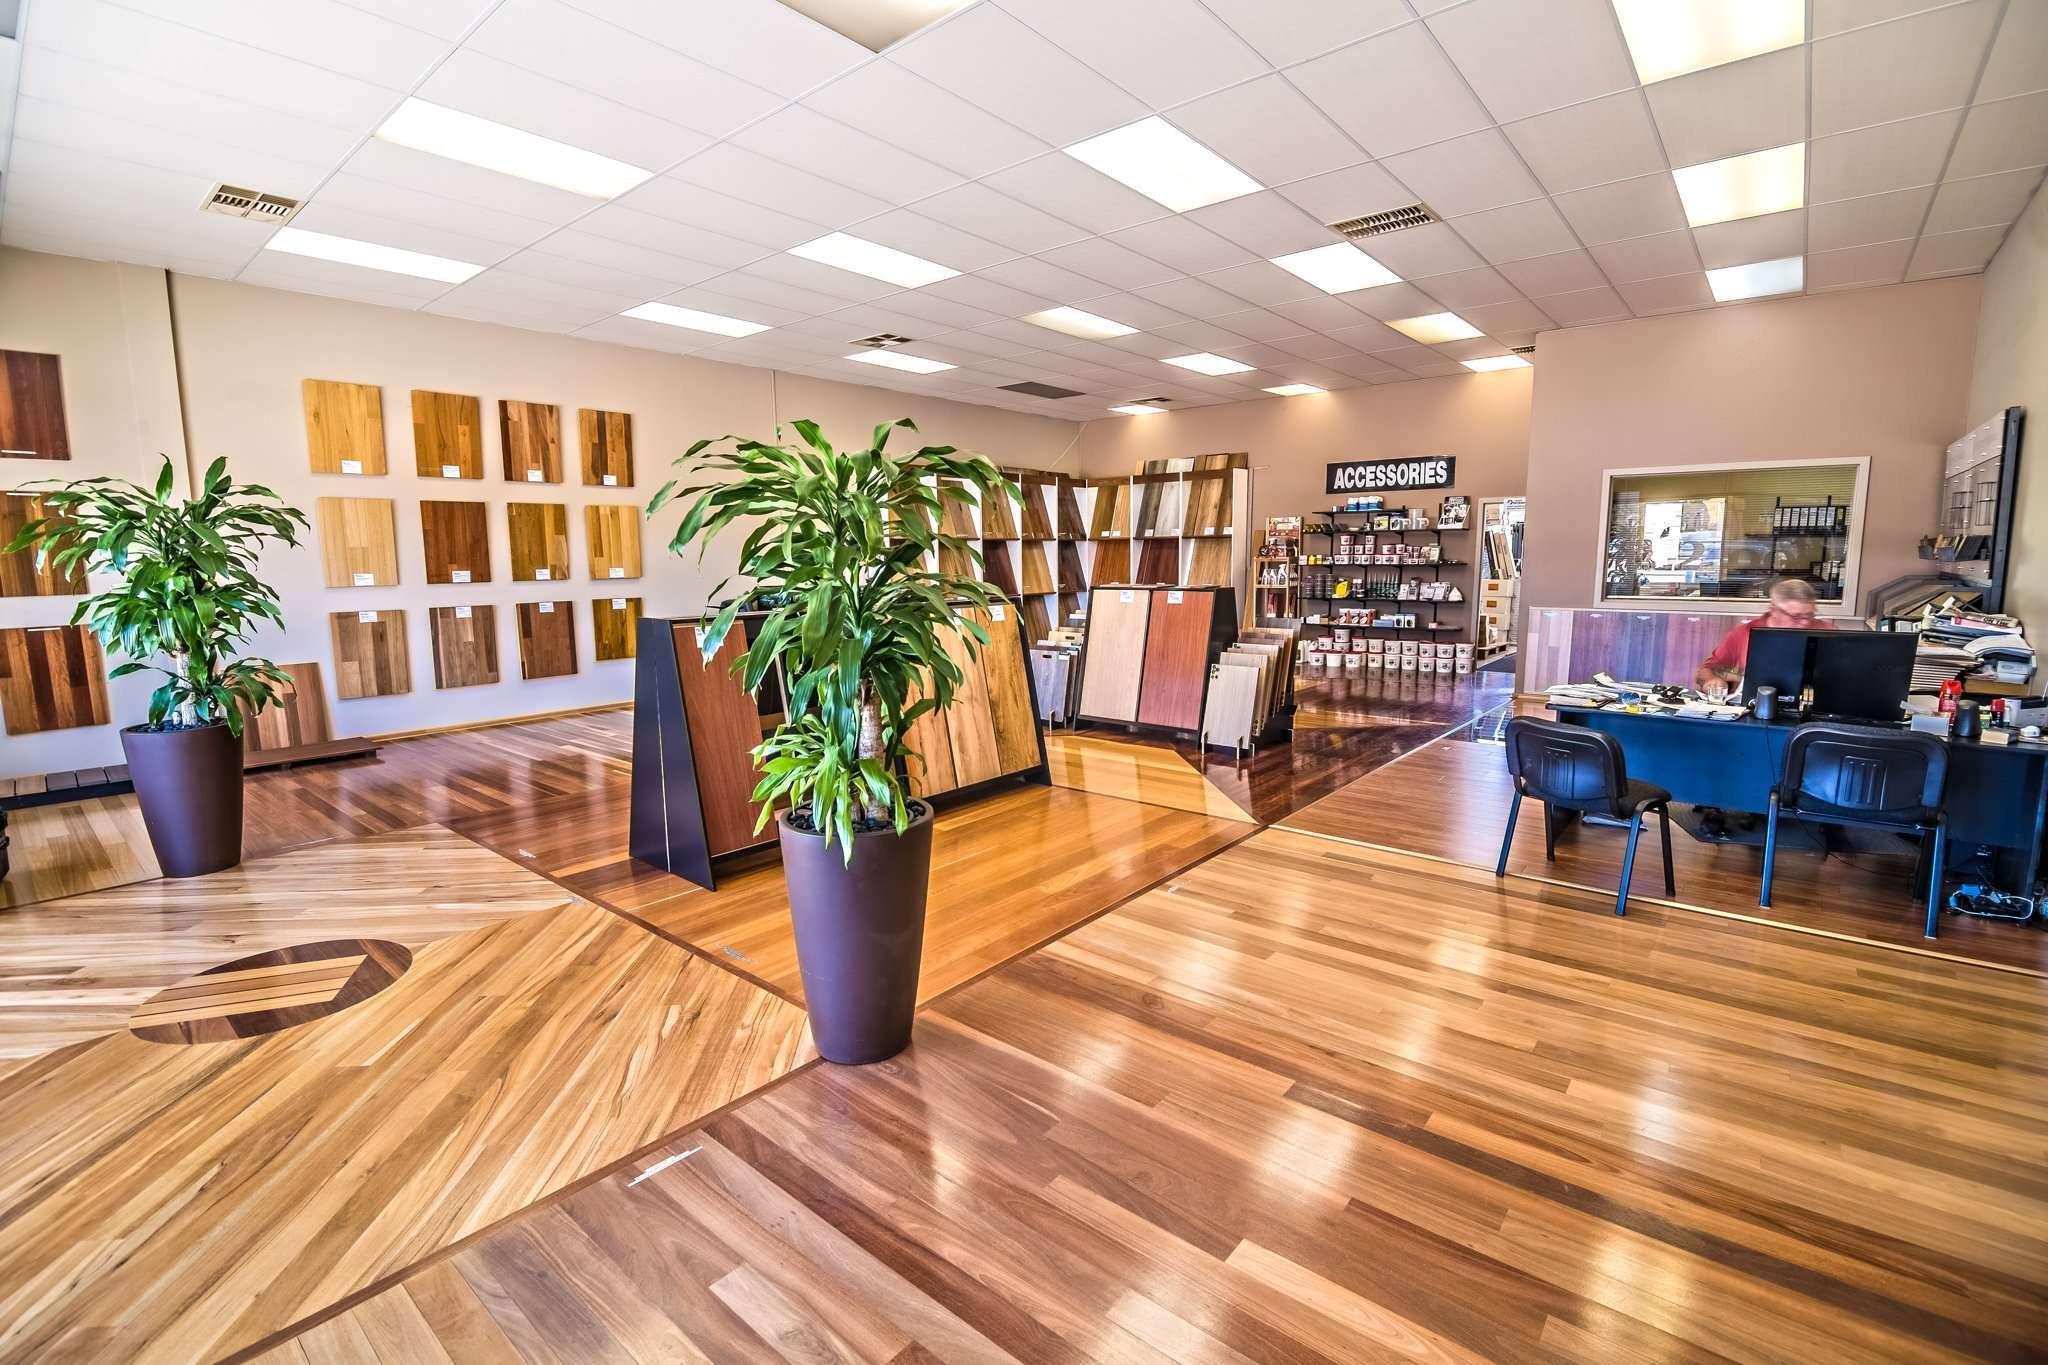 Tg Engineered Hardwood Flooring Of Wood Floor Price Lists A1 Wood Floors within 4 1451 Albany Hwy Cannington